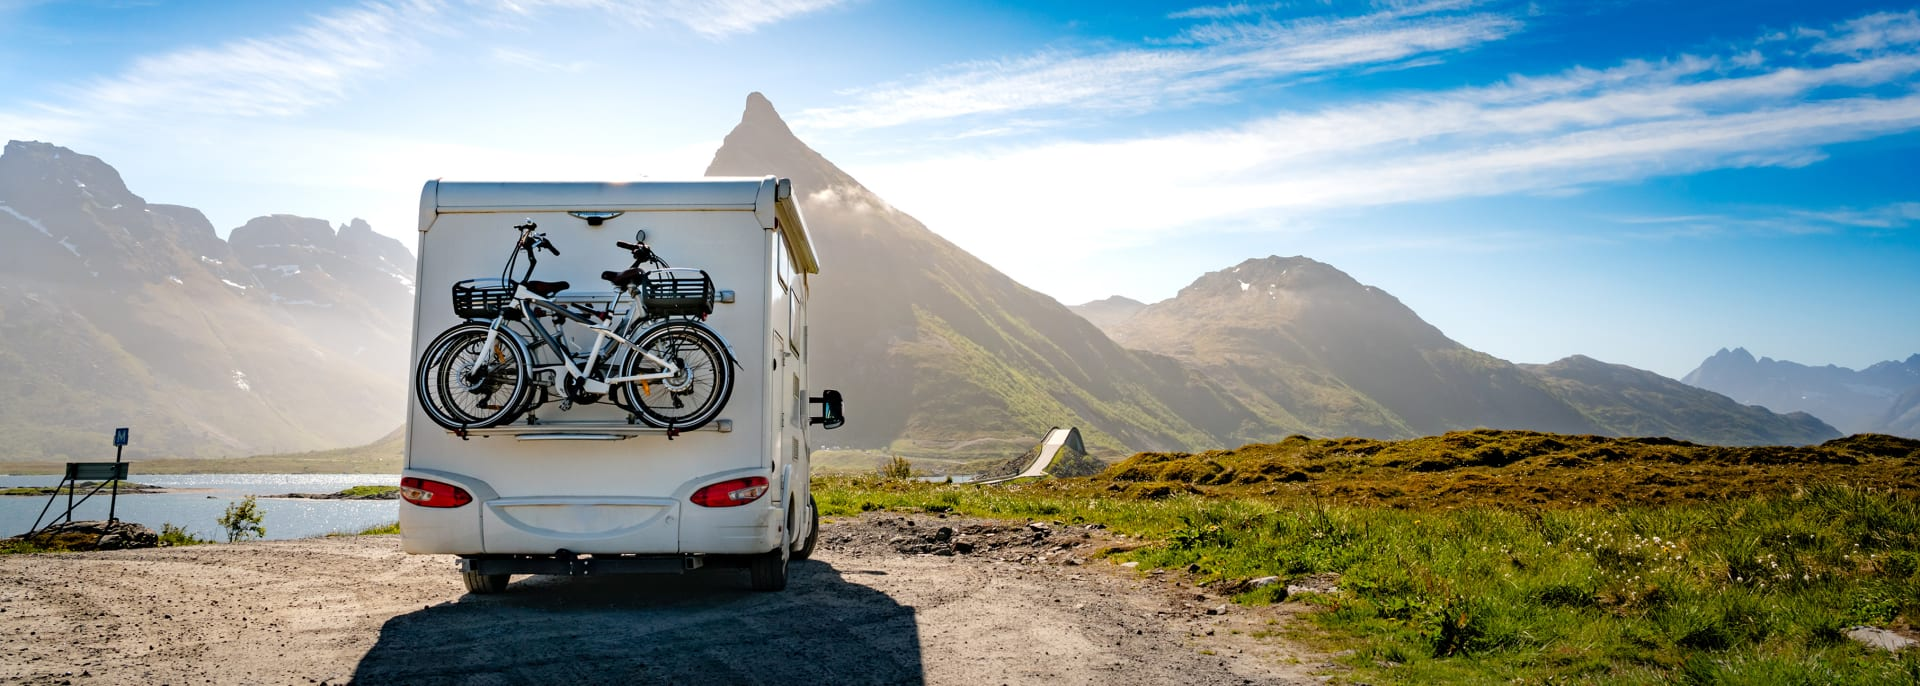 Camping, Neuseeland